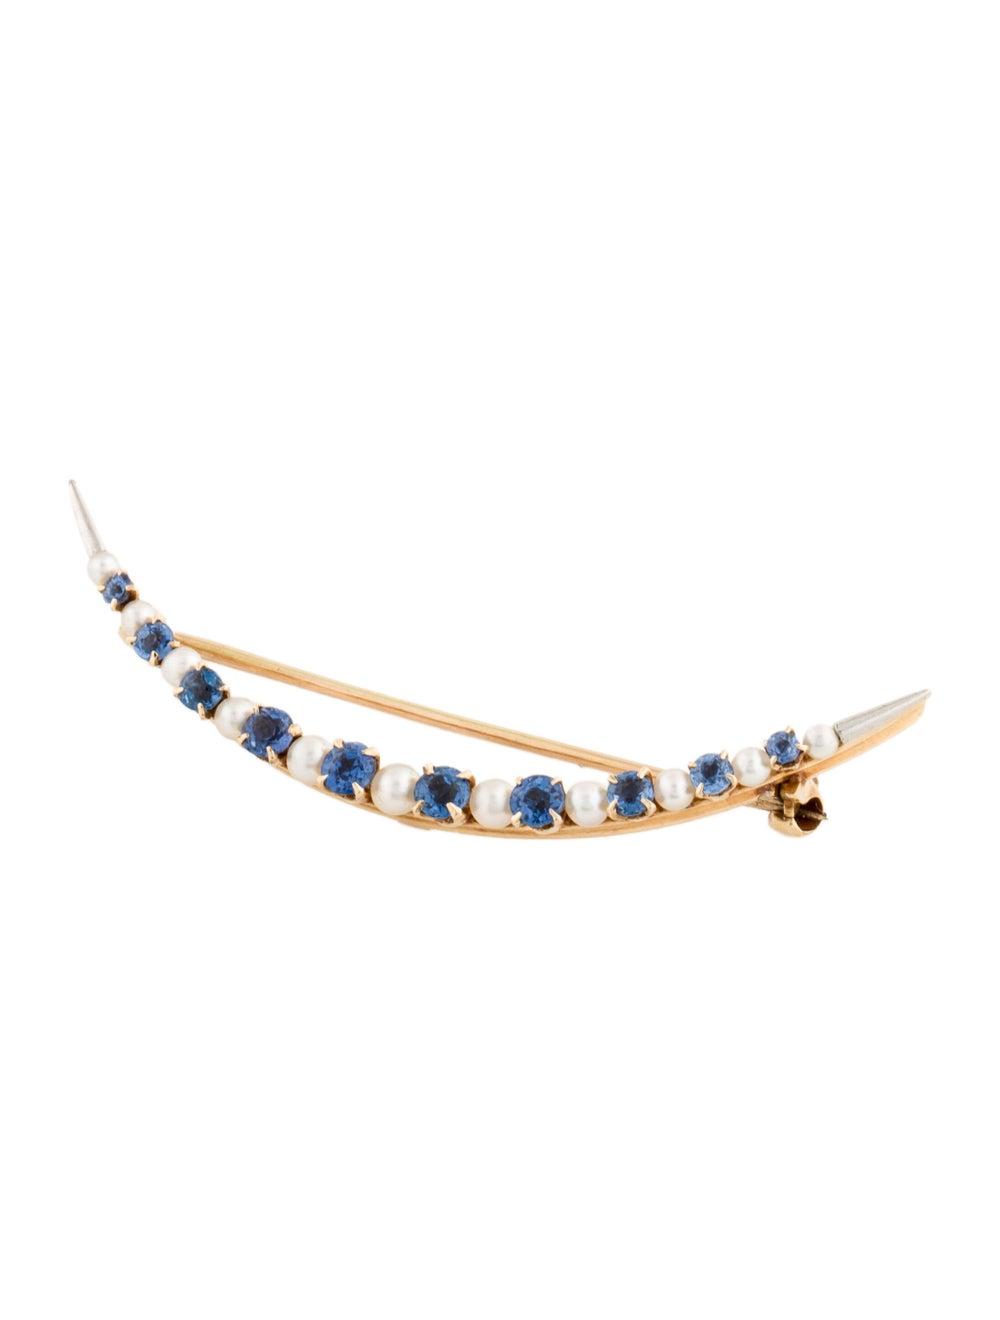 Brooch Vintage Sapphire & Pearl Brooch Yellow - image 3